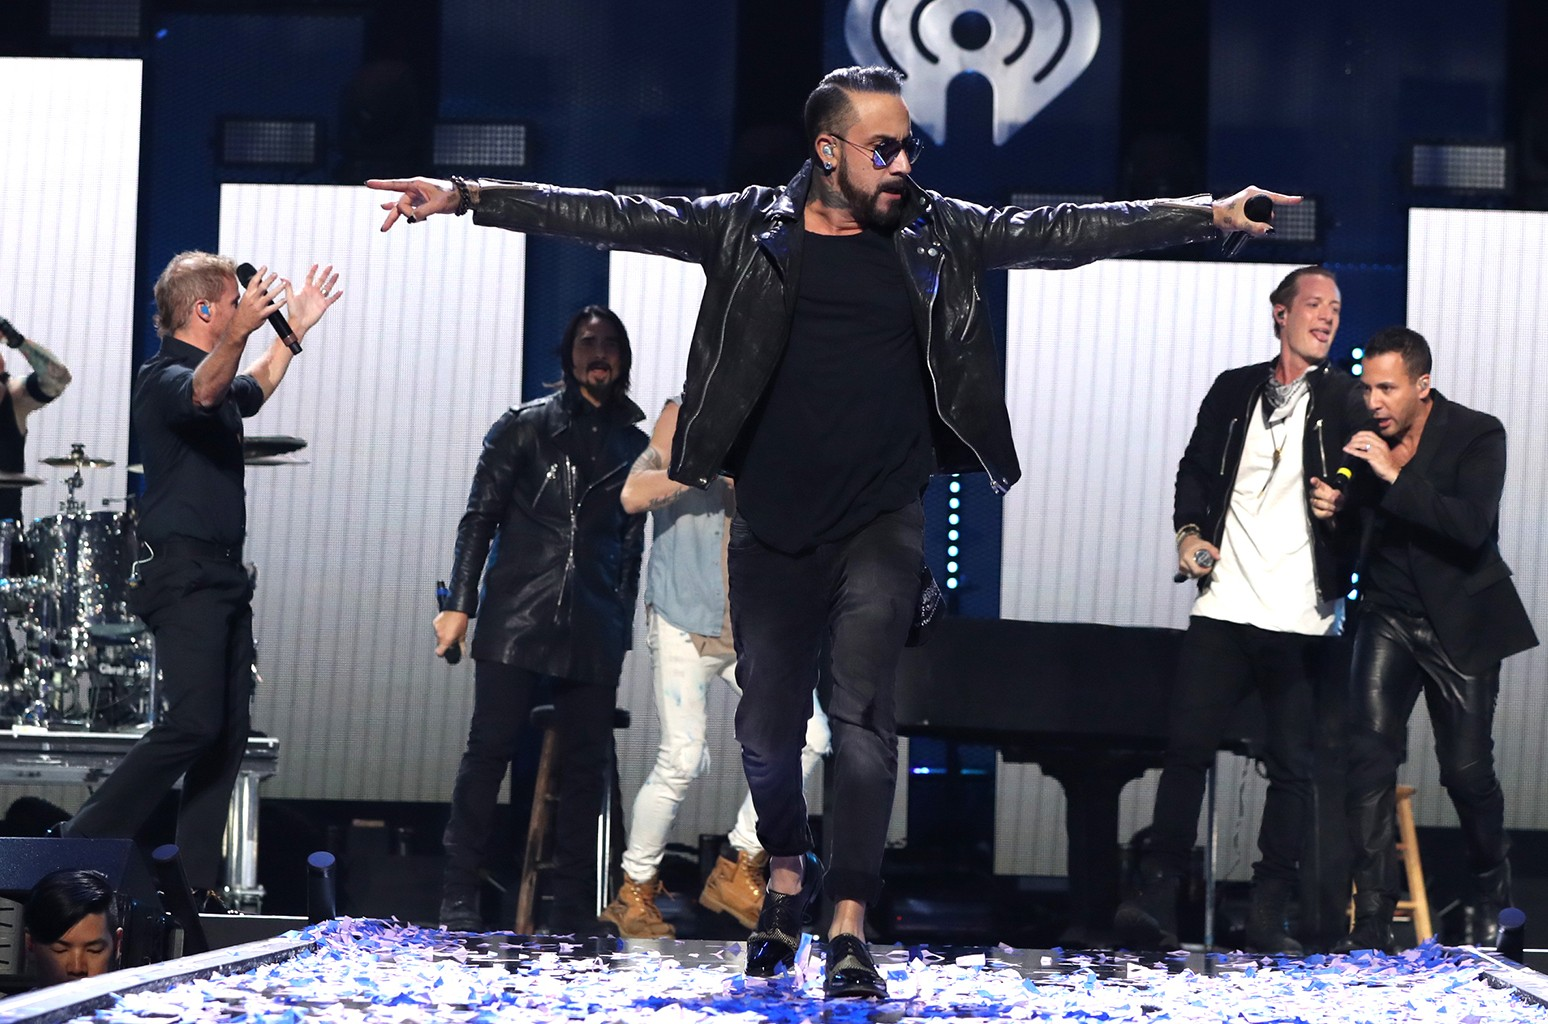 Backstreet Boys and Florida Georgia Line